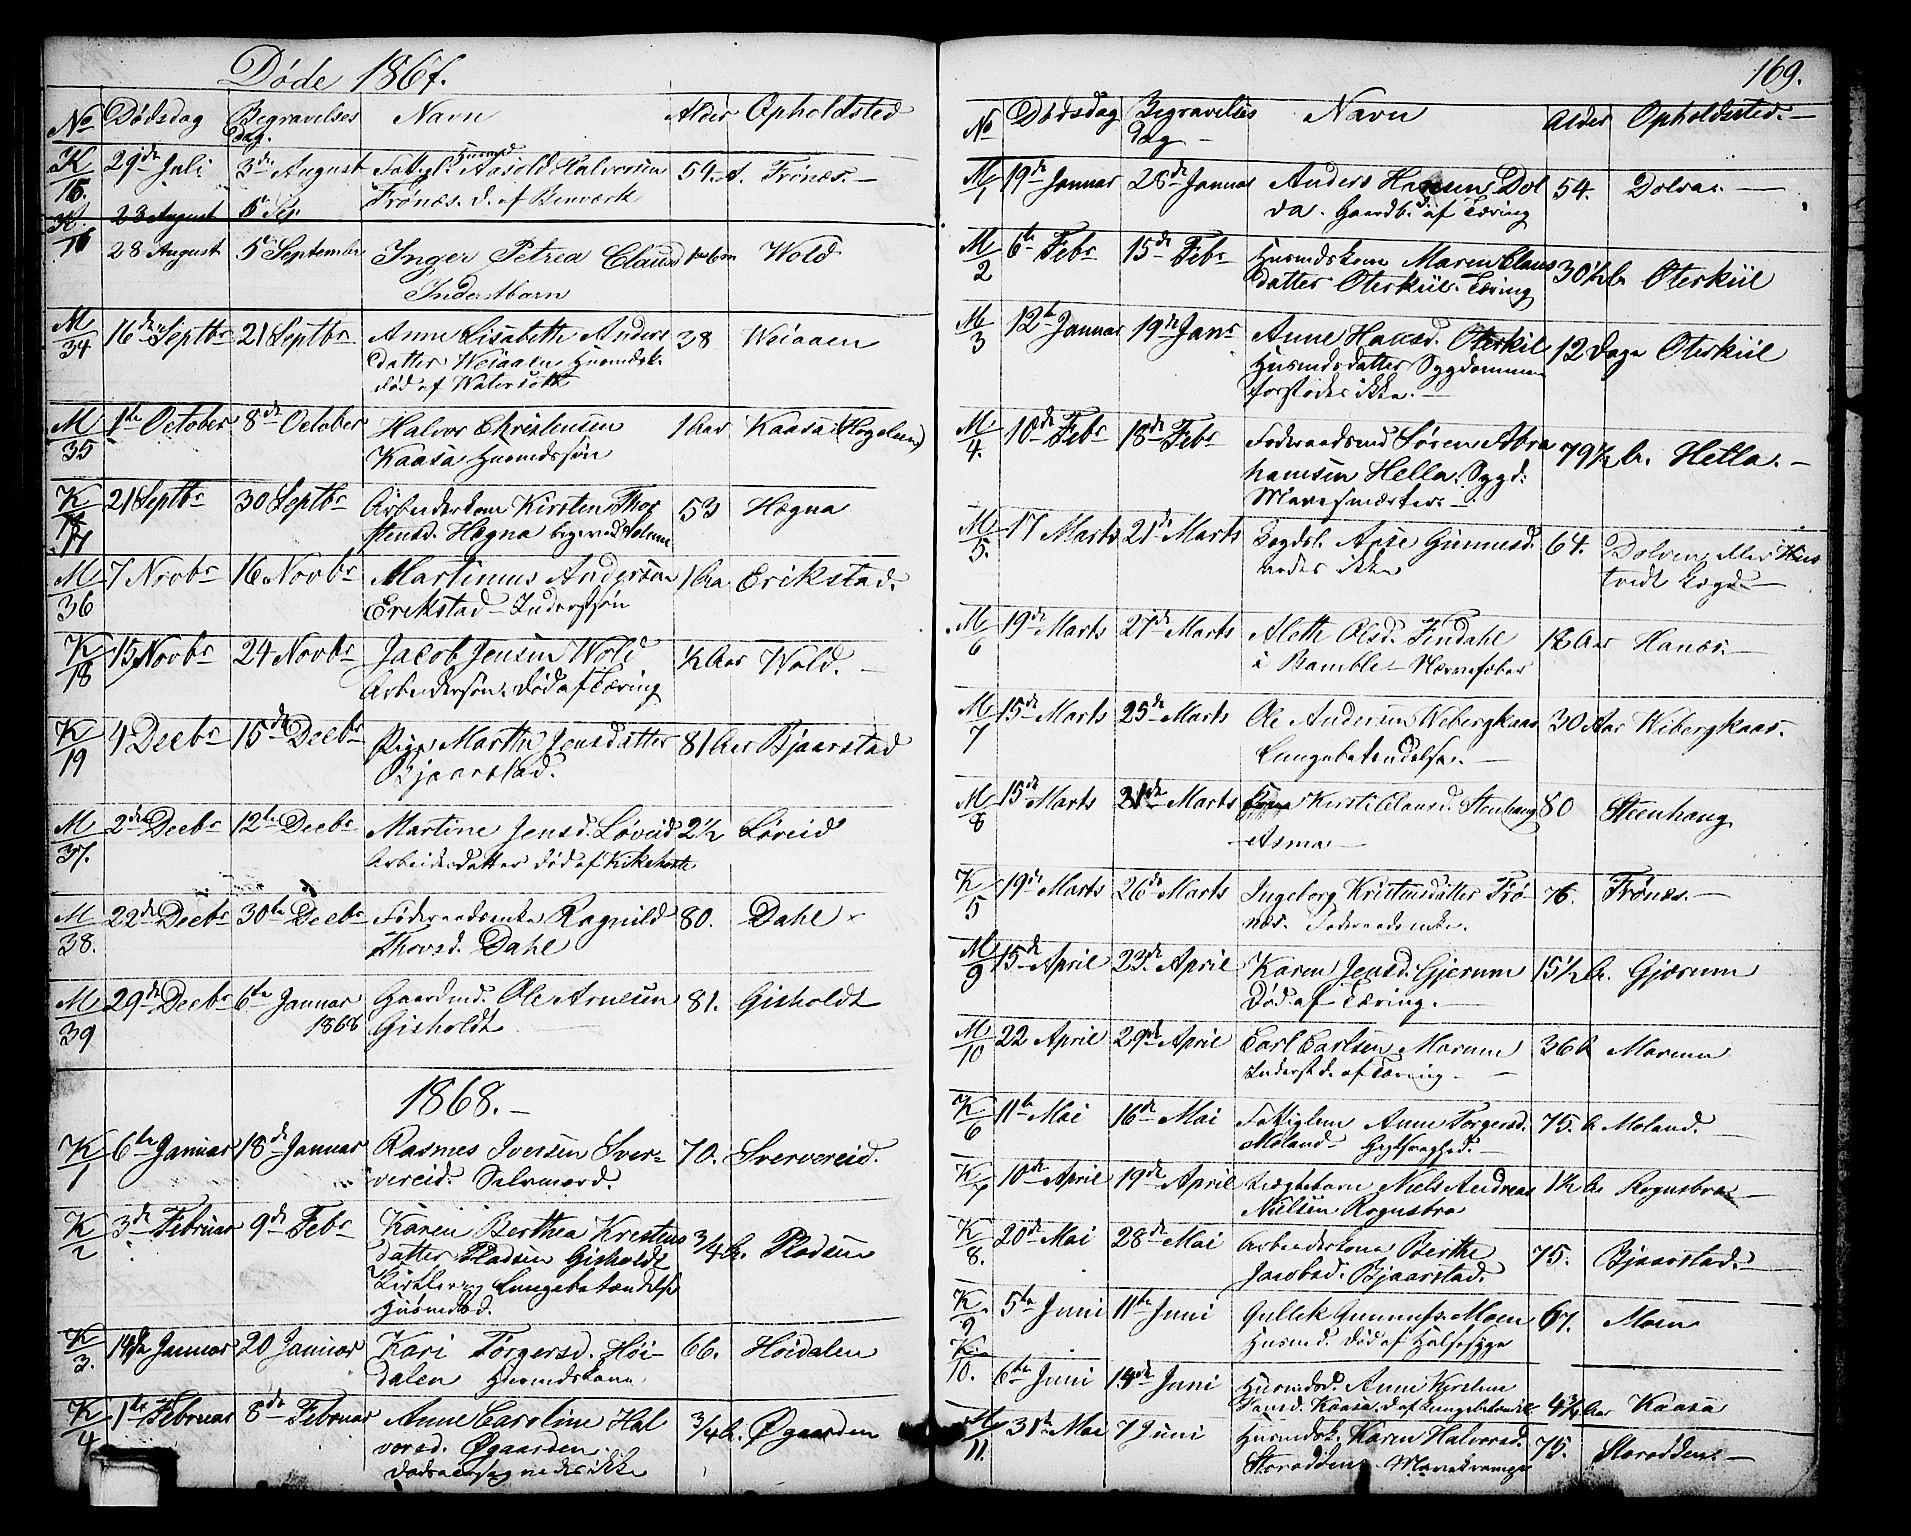 SAKO, Solum kirkebøker, G/Gb/L0002: Klokkerbok nr. II 2, 1859-1879, s. 169